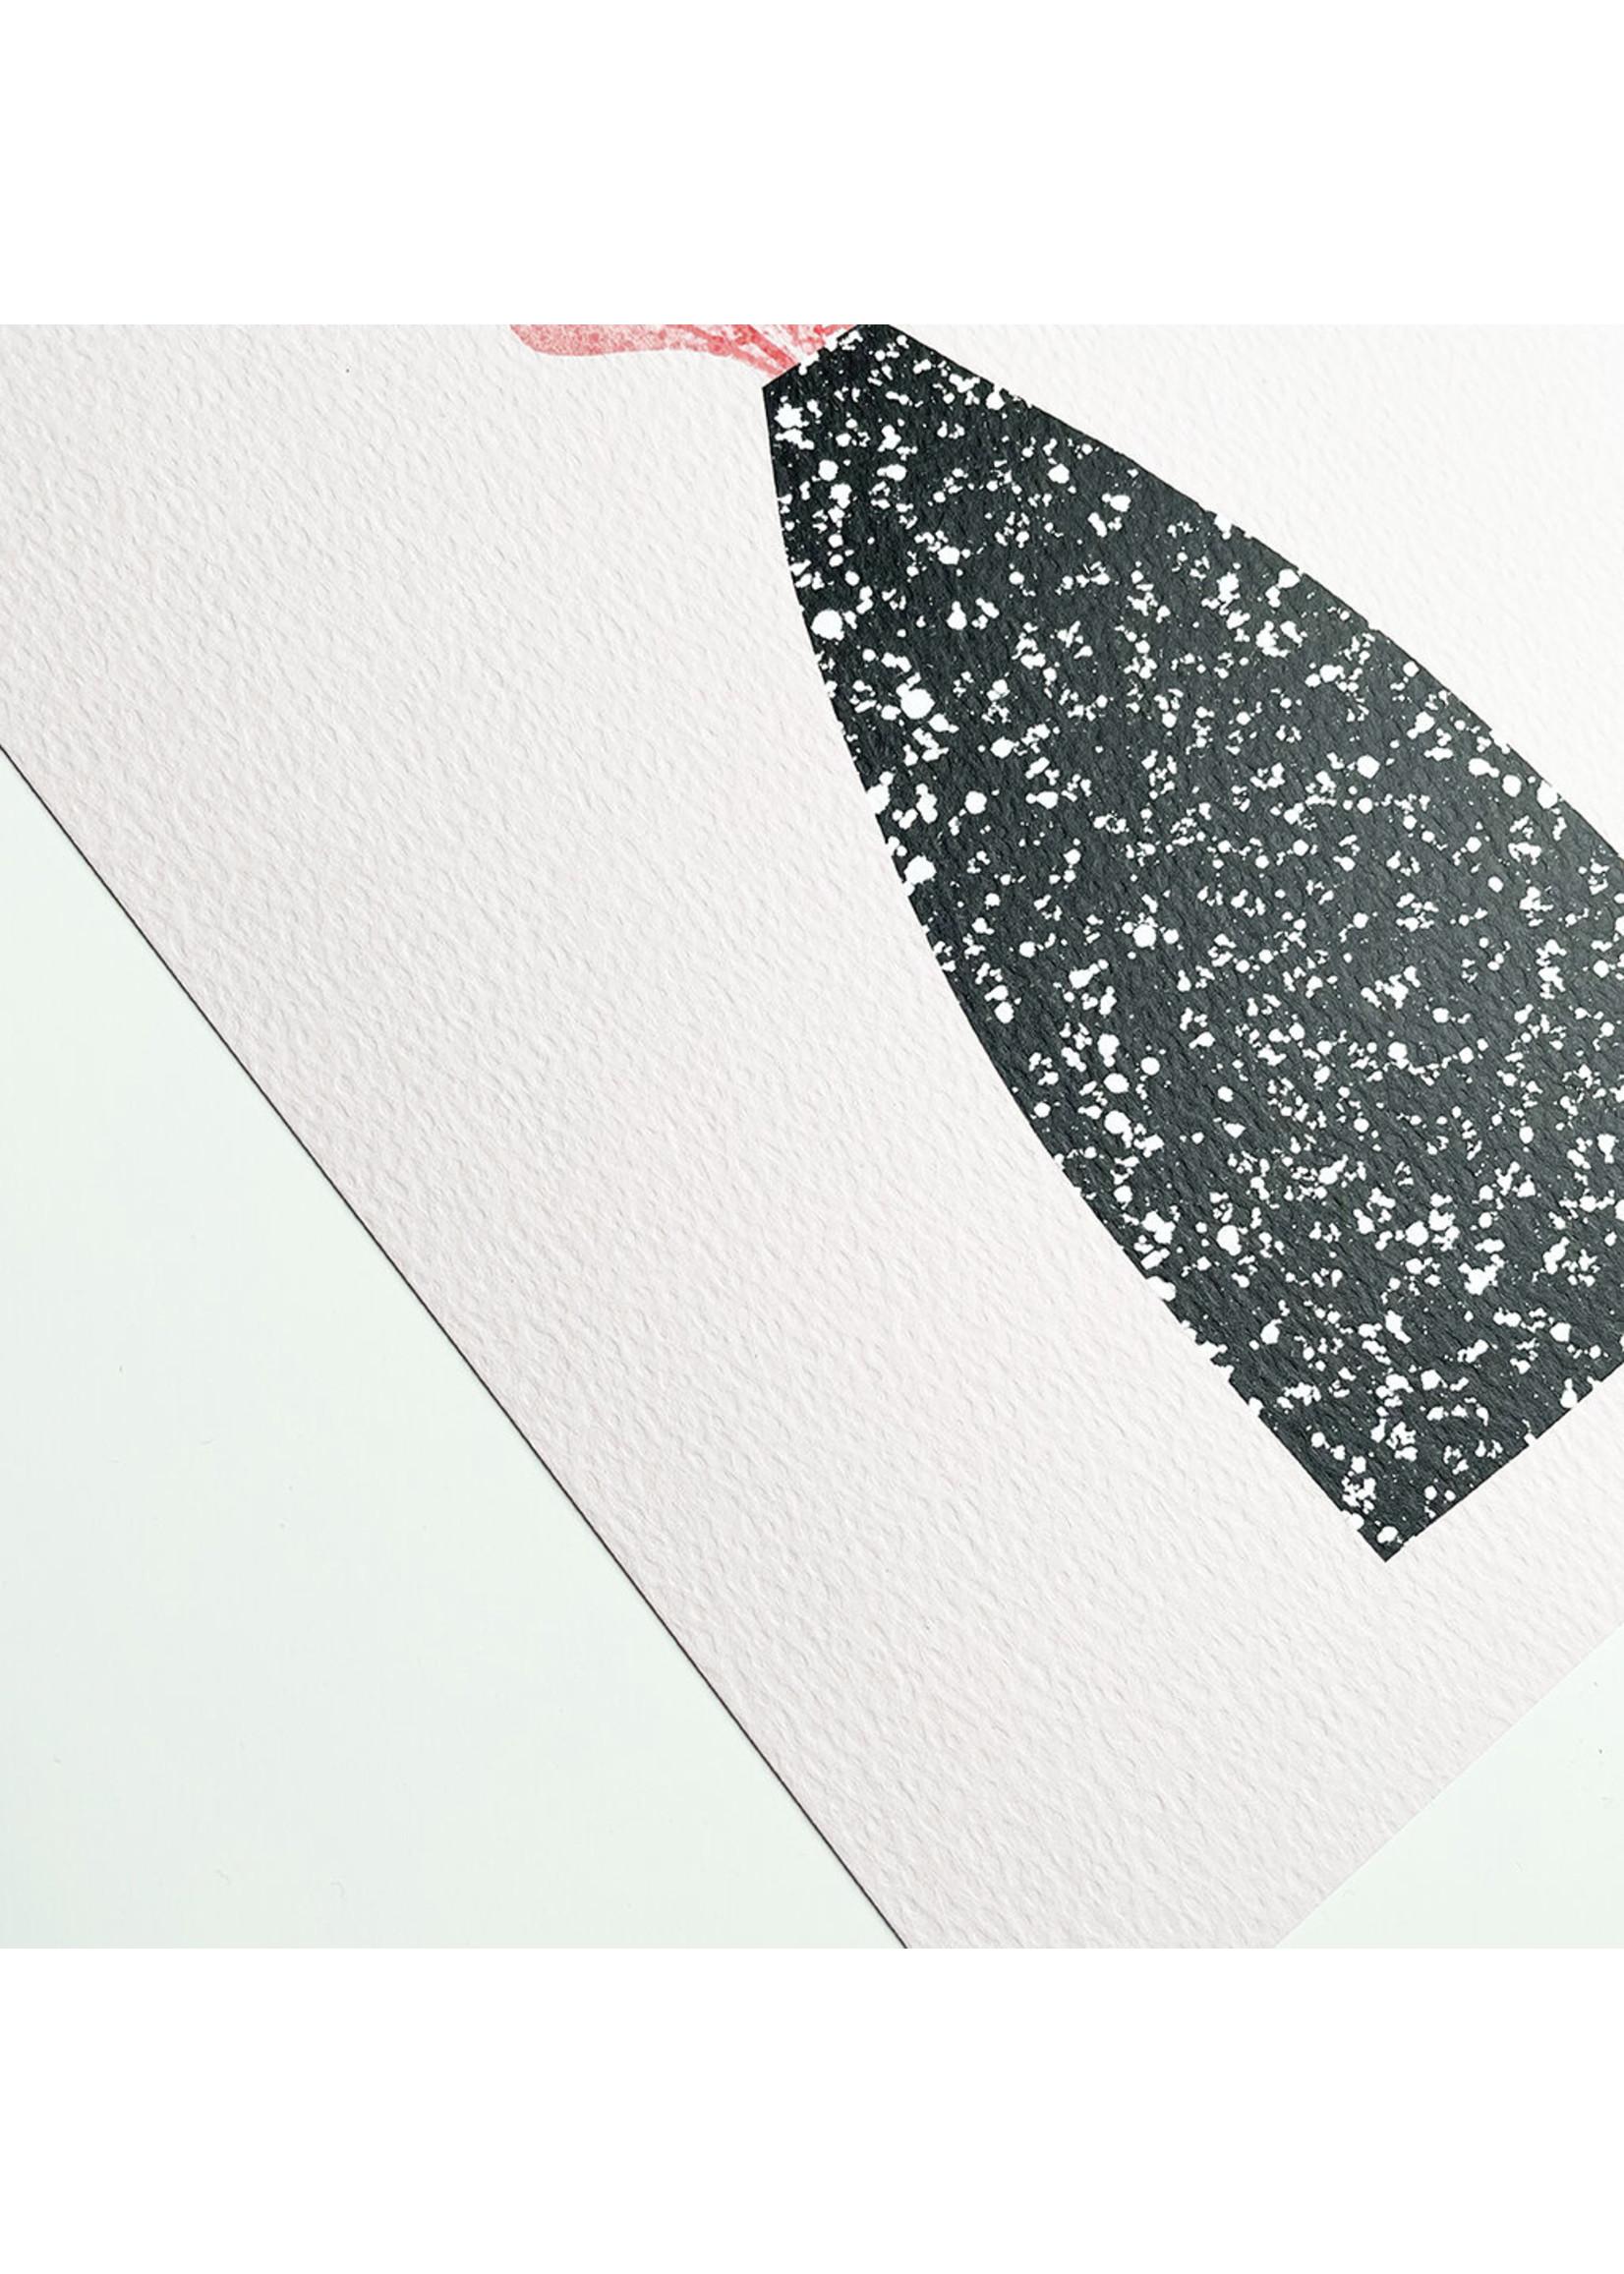 Melissa Doone Melissa Doone Leaves in Speckled Vase A3 Print